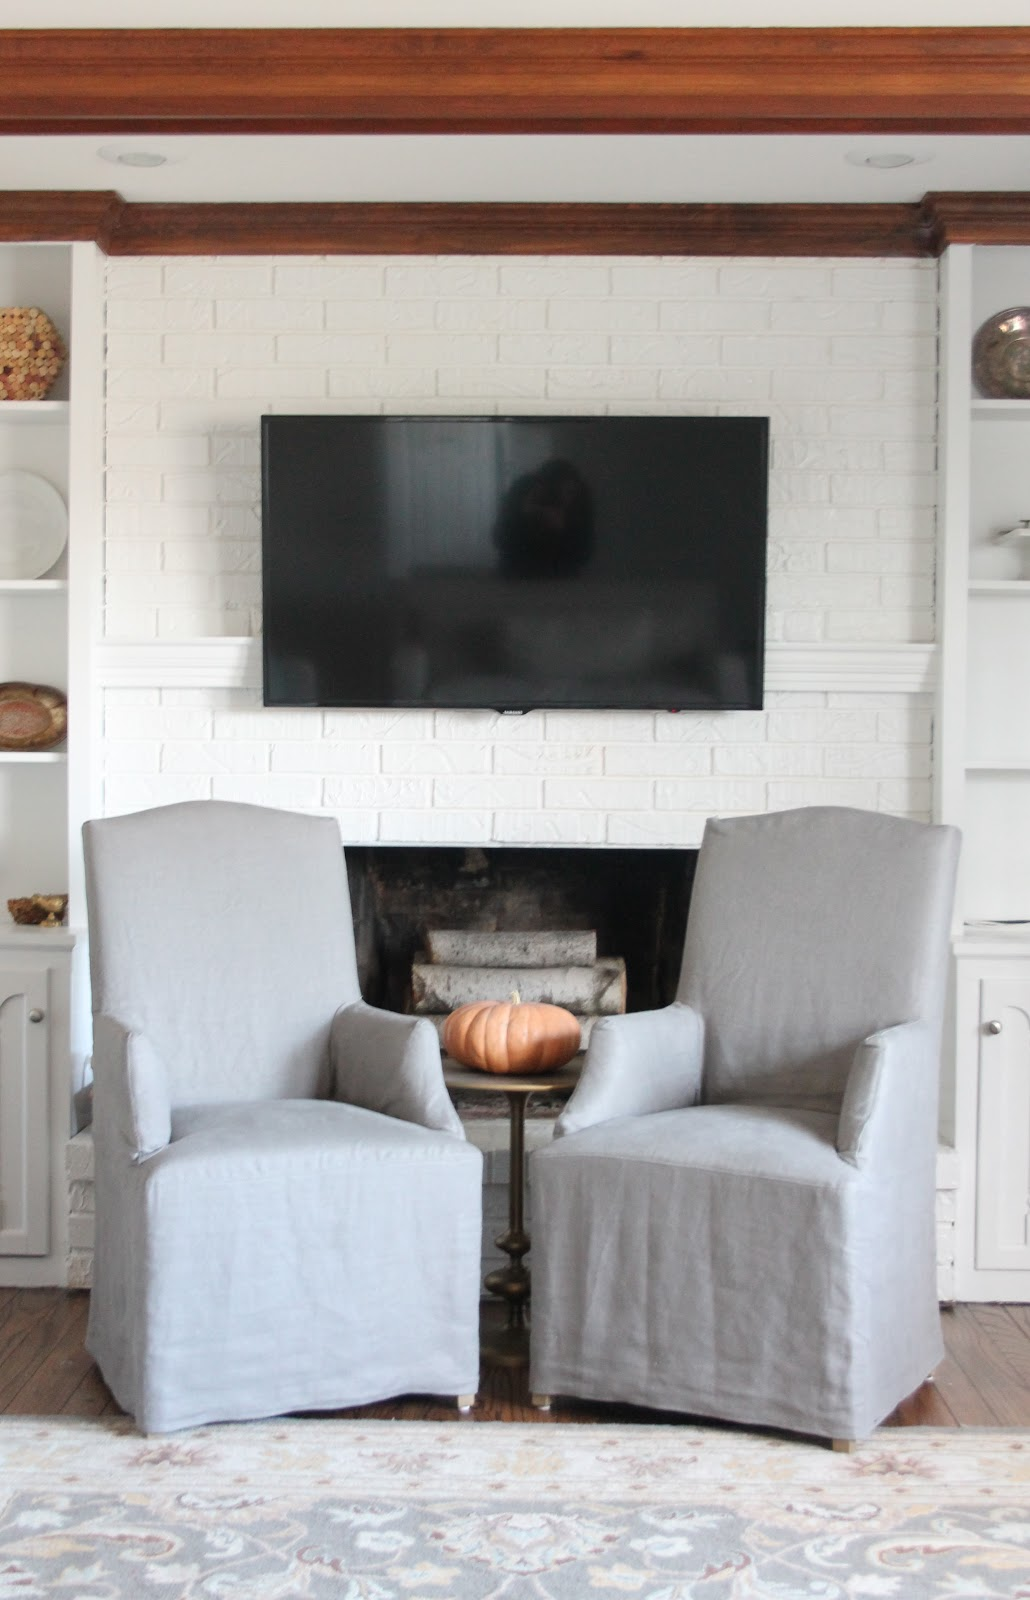 Hiding Cord on Wall Mount for Flat Screen TV | DIY Mantel ...